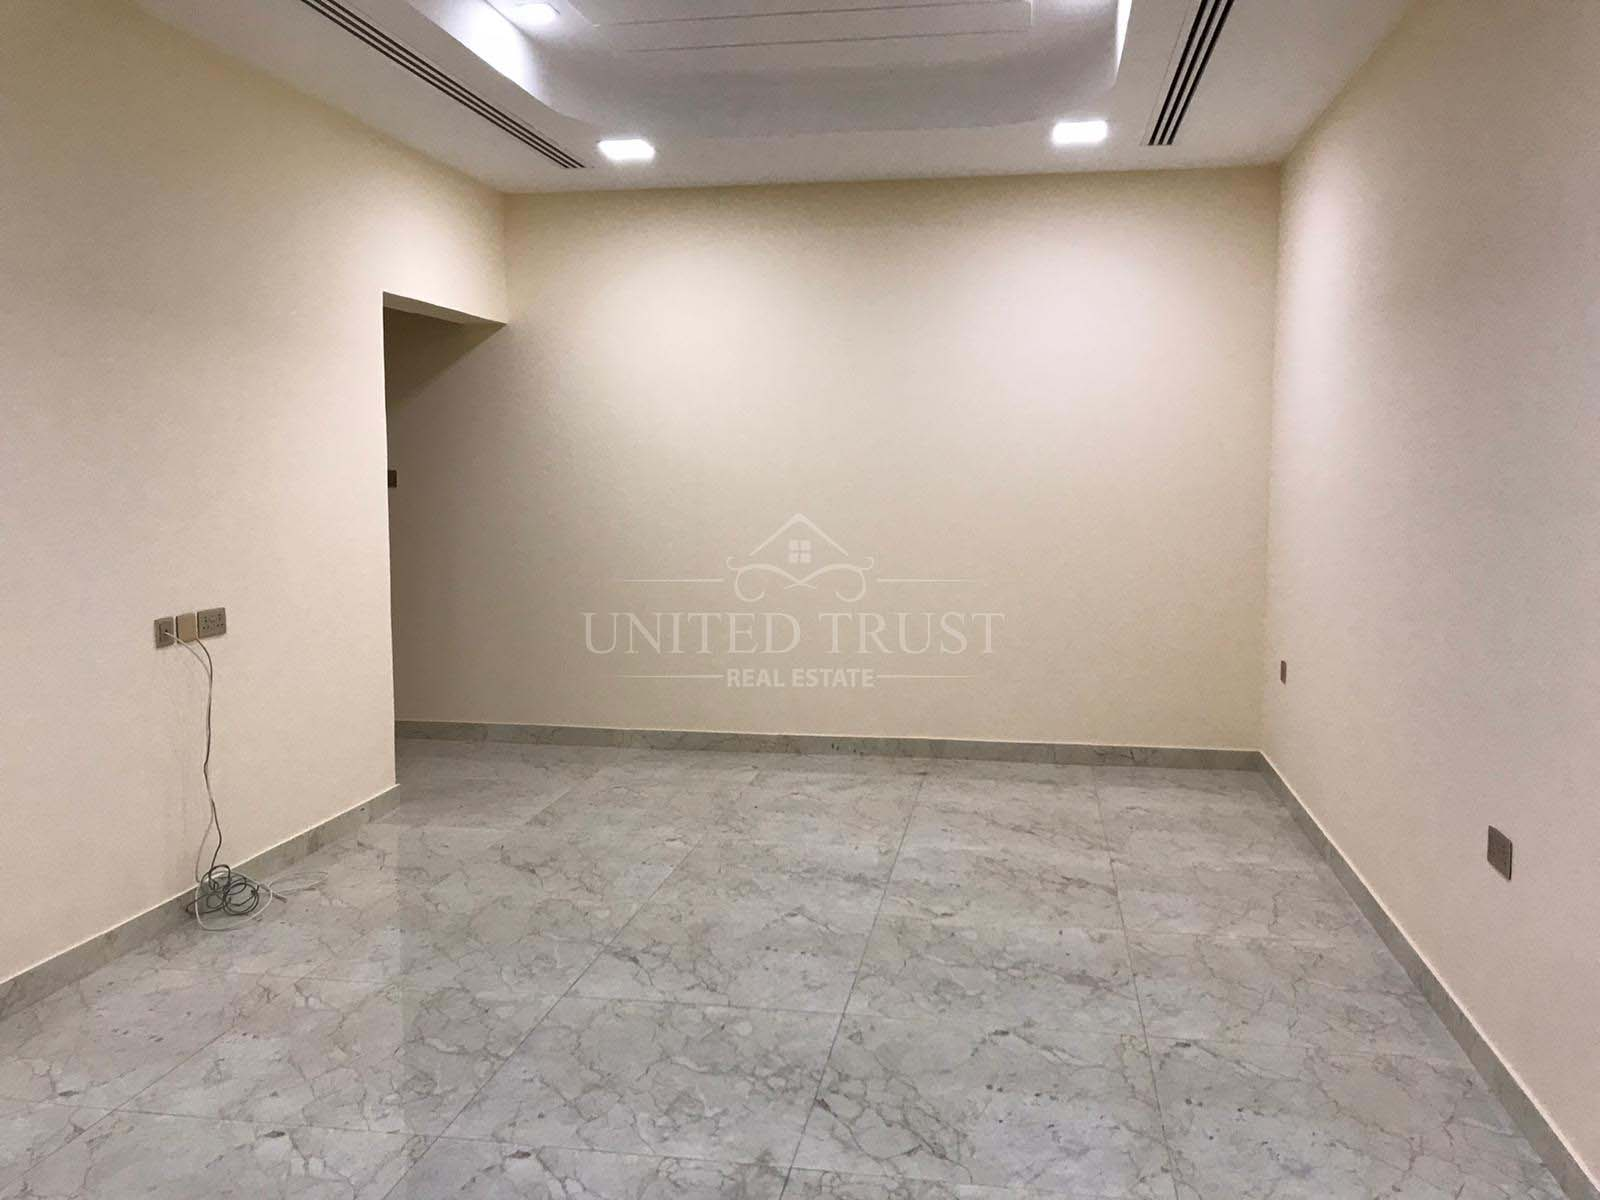 For rent a semi-furnished flat in Tubli Ref: TUB-AZ-028